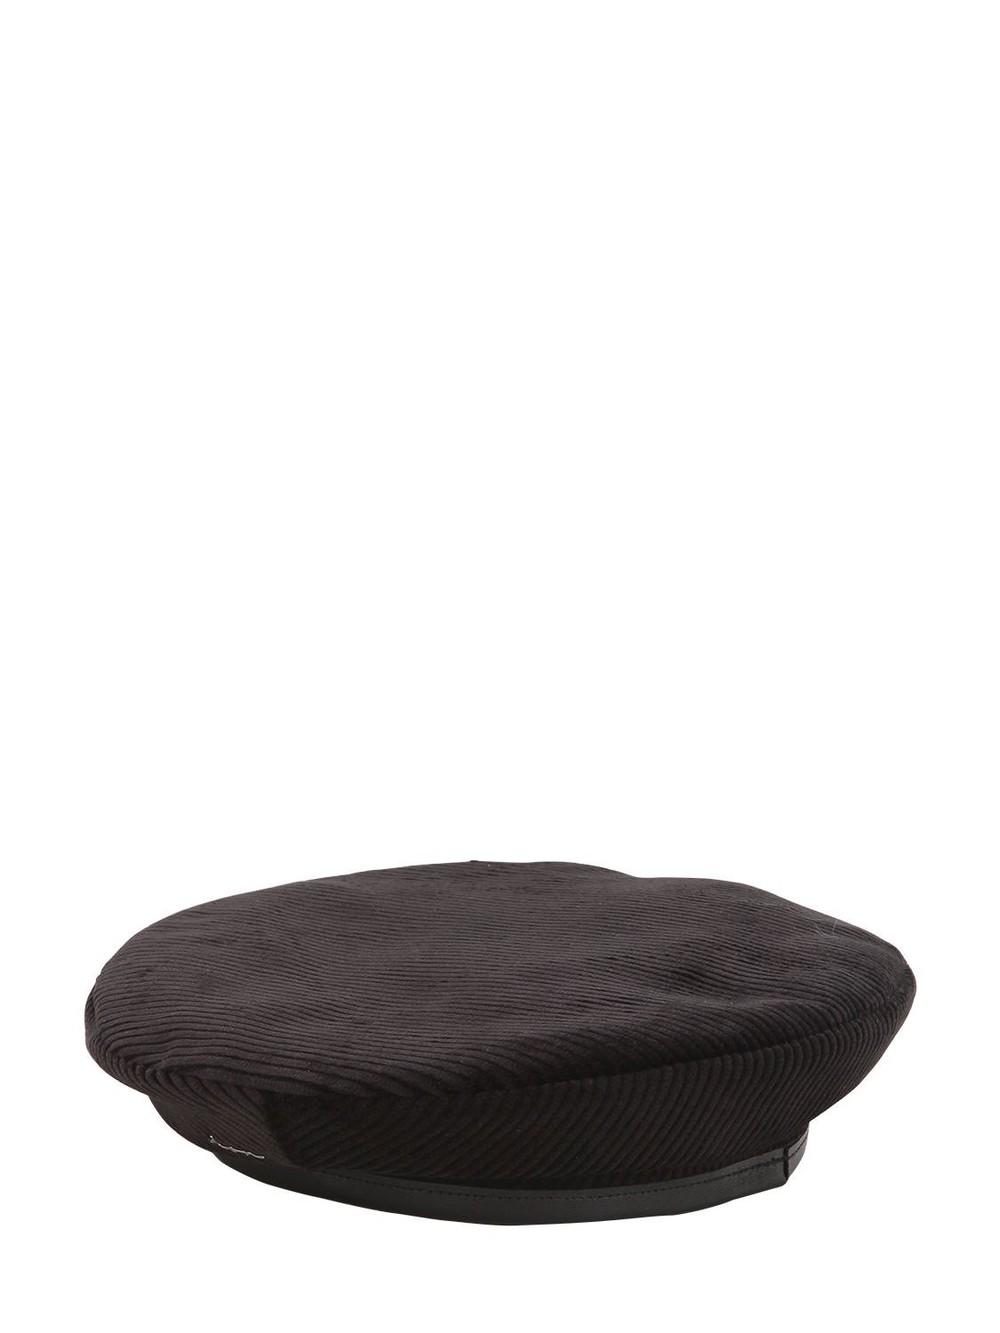 DON Corduroy Beret in black